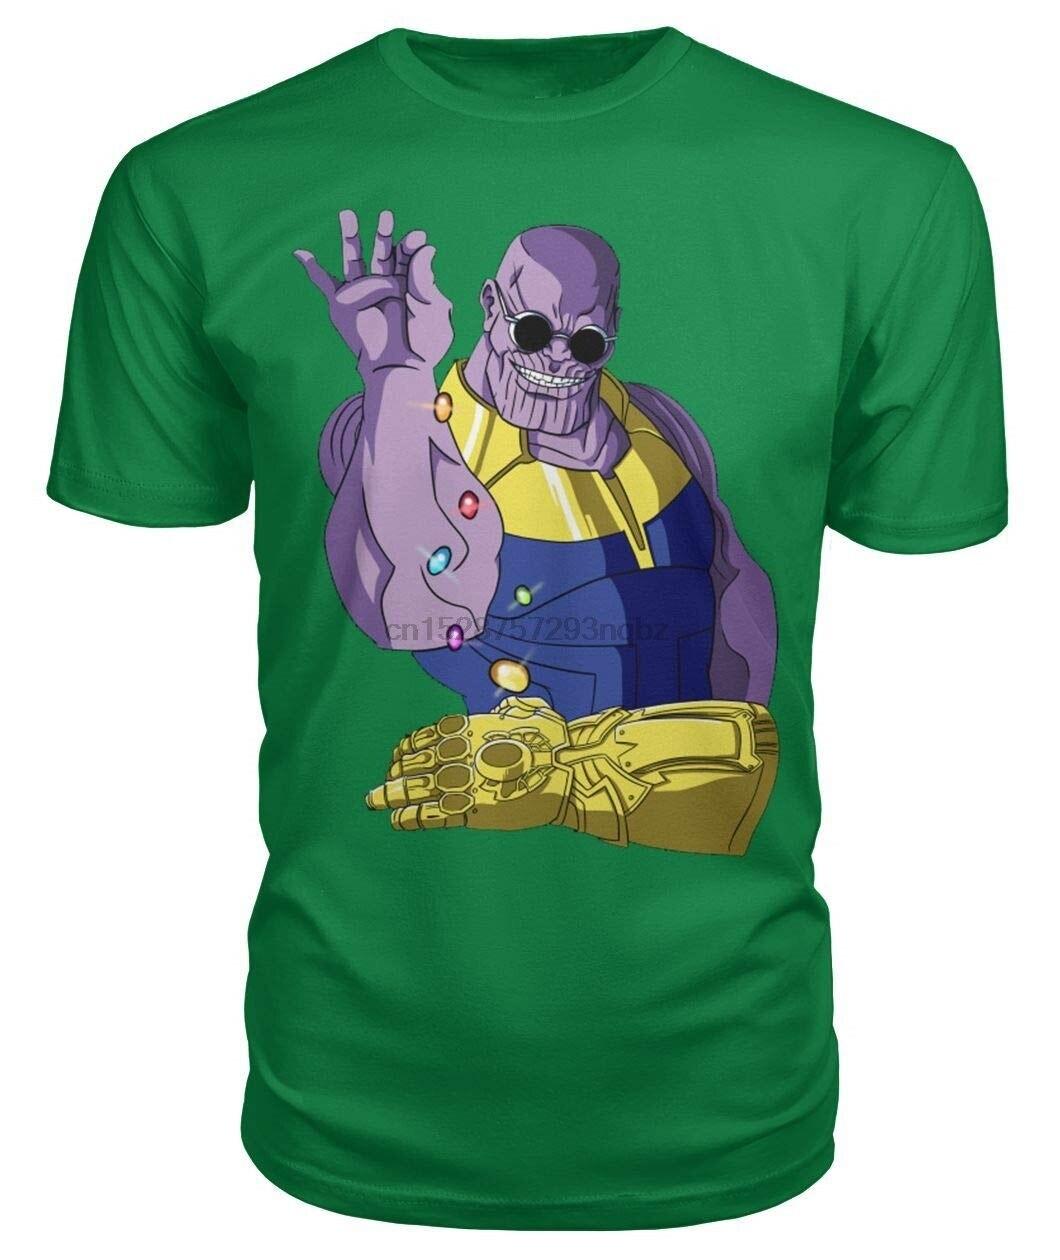 Camiseta Unisex Thanos Smiling Salt Bae divertida inspirada parodia-vengadores